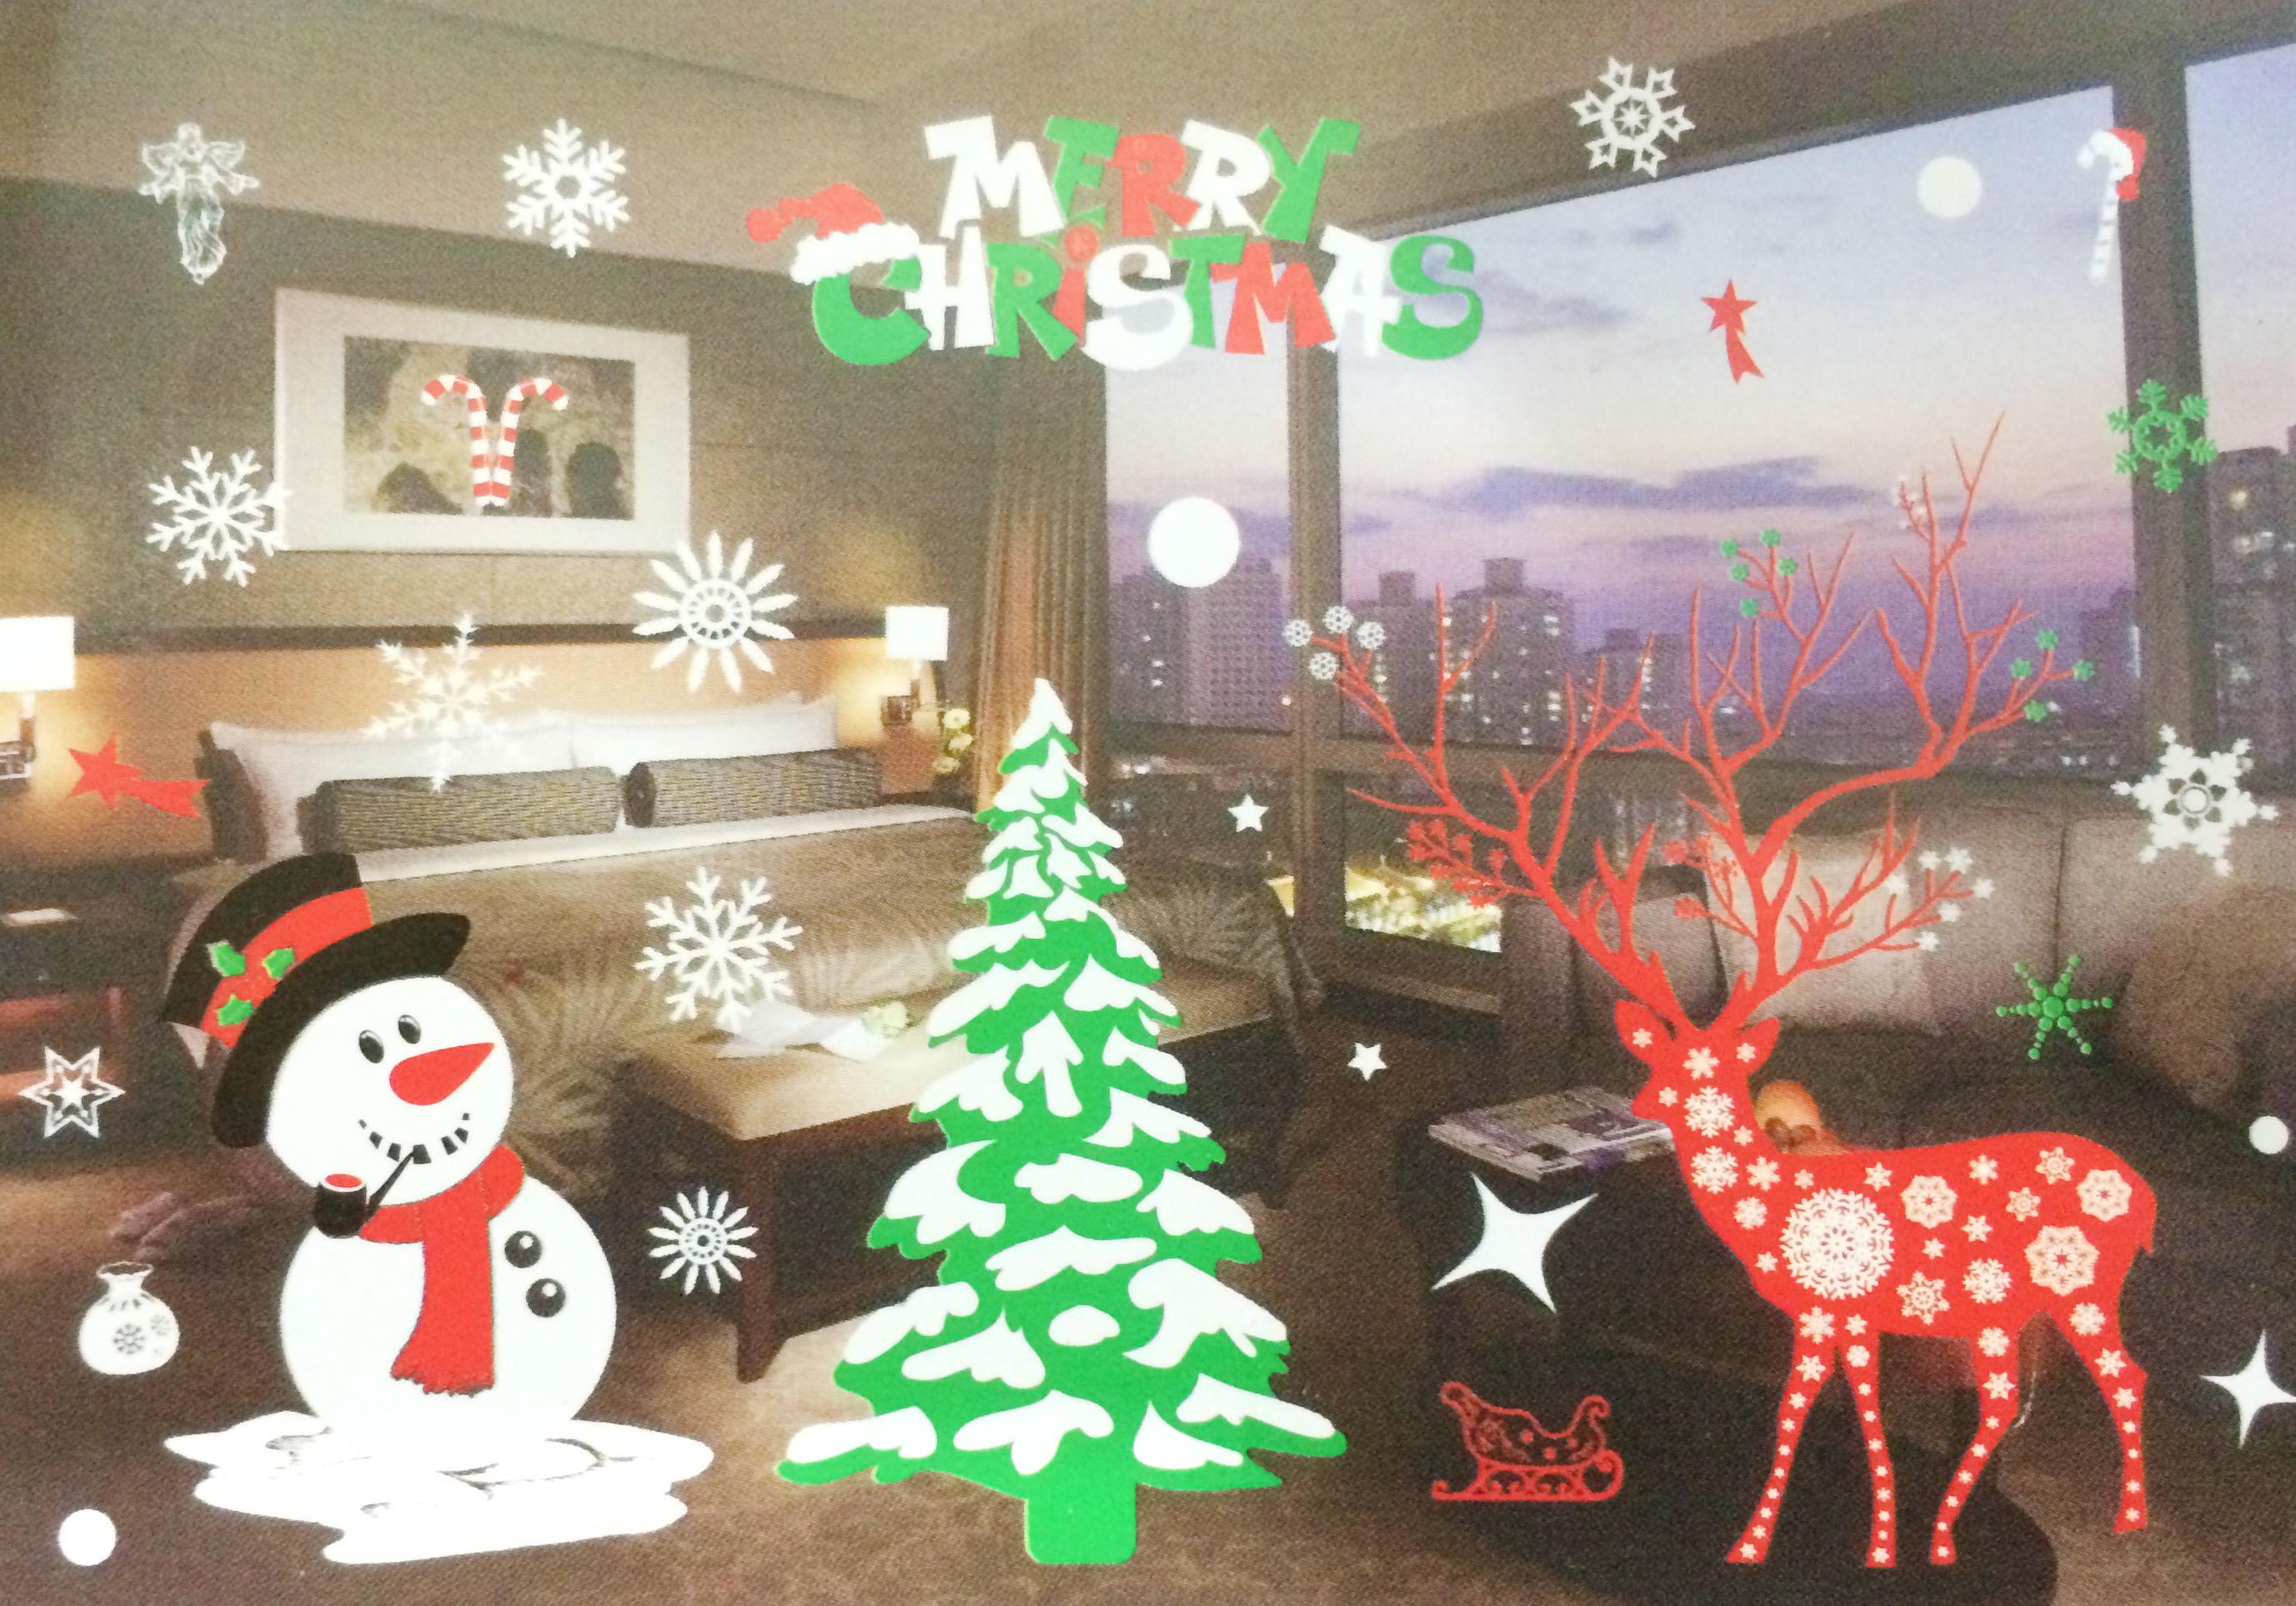 X射線【X150022】雪人麋鹿靜電窗貼,聖誕節/聖誕擺飾/聖誕佈置/聖誕造景/聖誕裝飾/玻璃貼/牆面佈置/壁貼